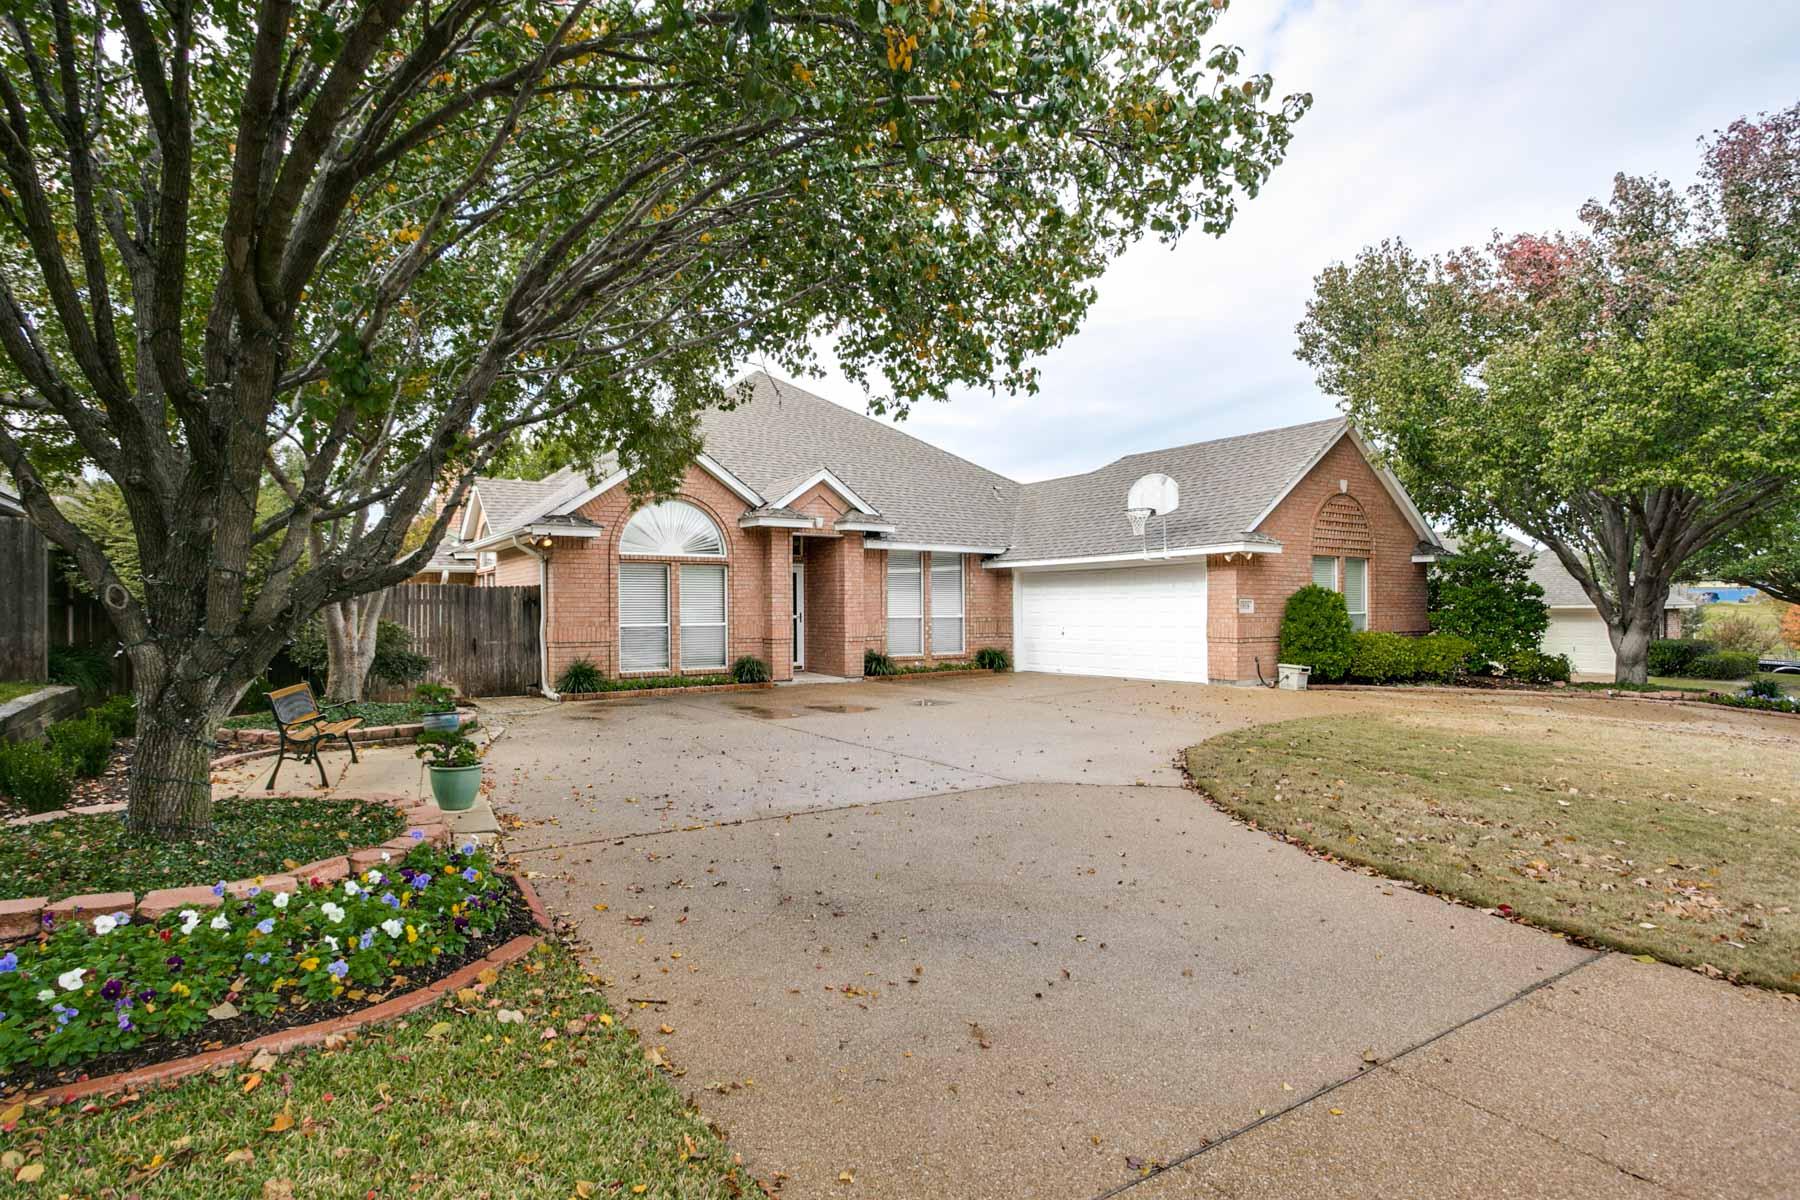 Single Family Home for Sale at Quail Ridge Estates 6908 Tameron Trail Fort Worth, Texas, 76132 United States